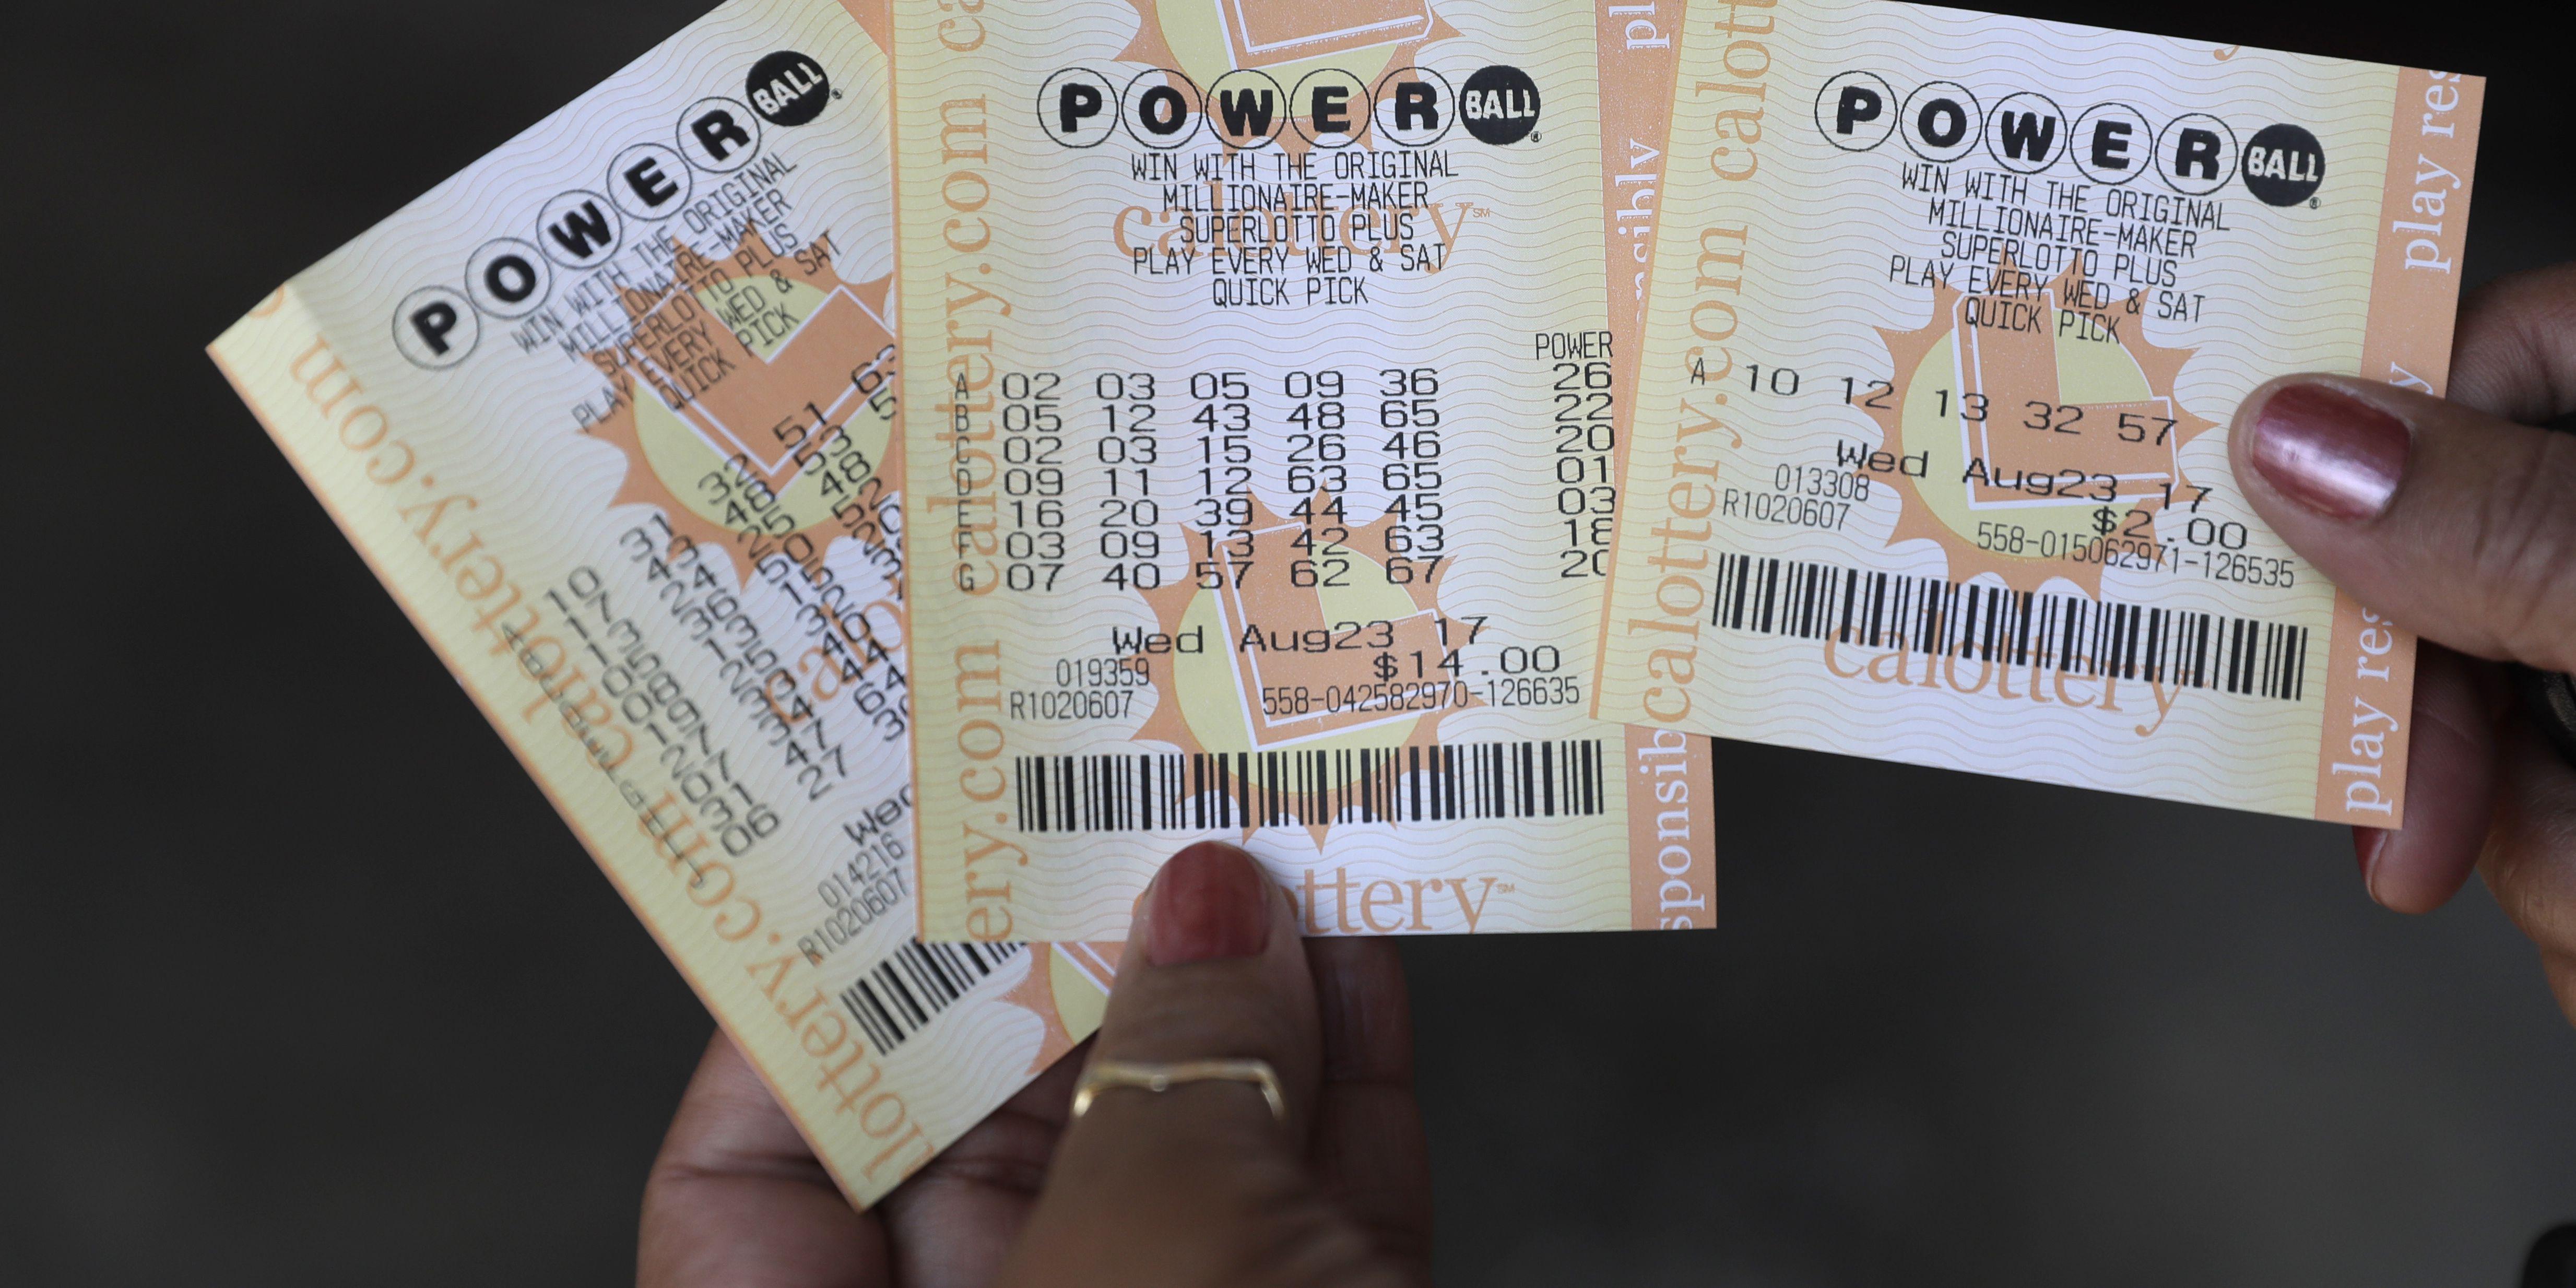 With no winner, Powerball jackpot soars to $550 million